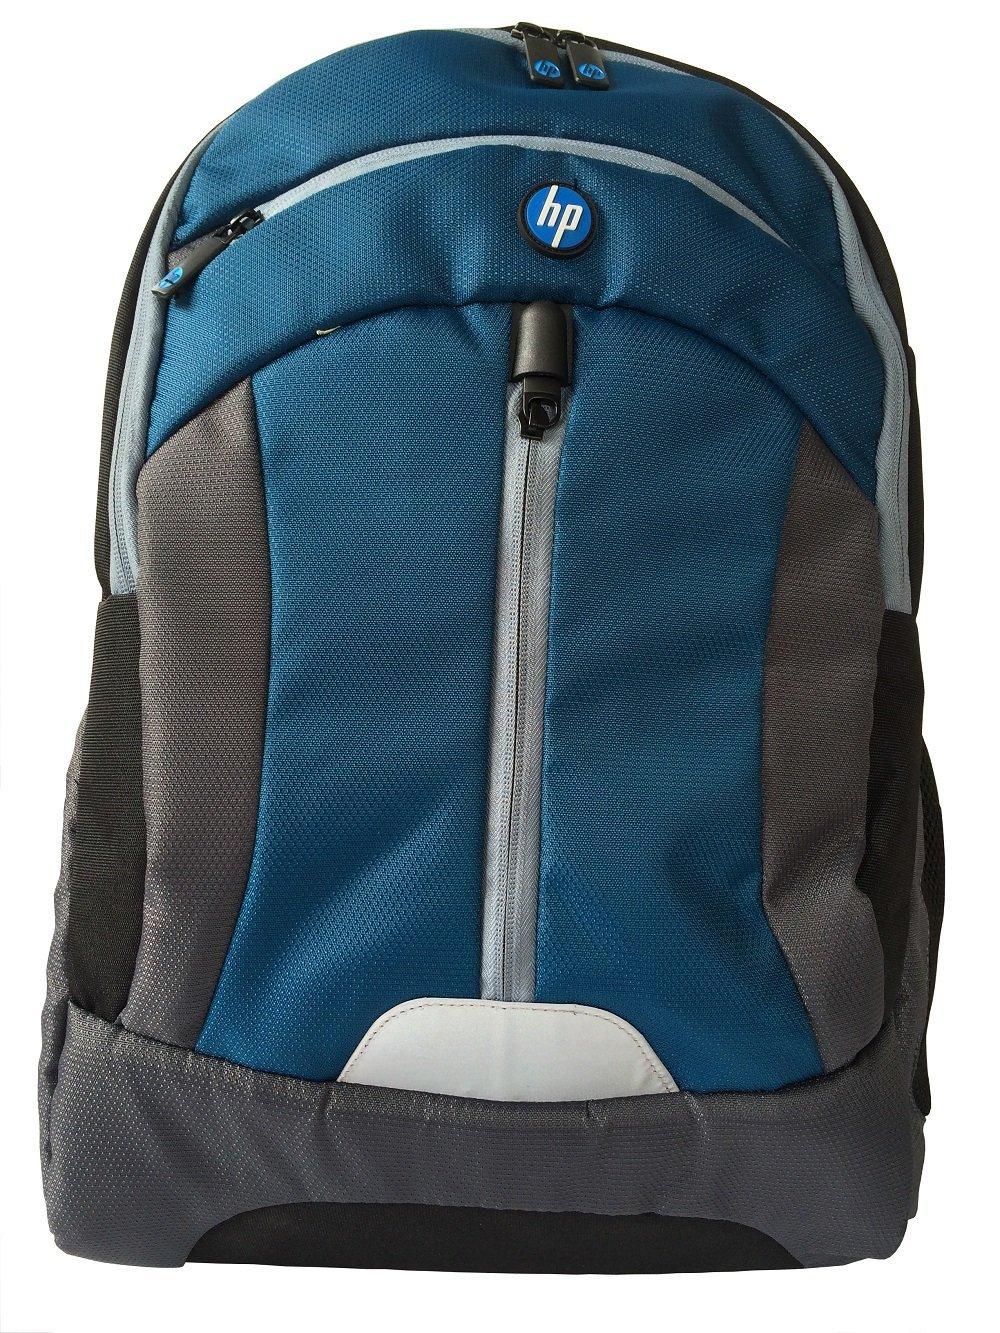 School bags online cash on delivery - Hp Trendsetter Backpack